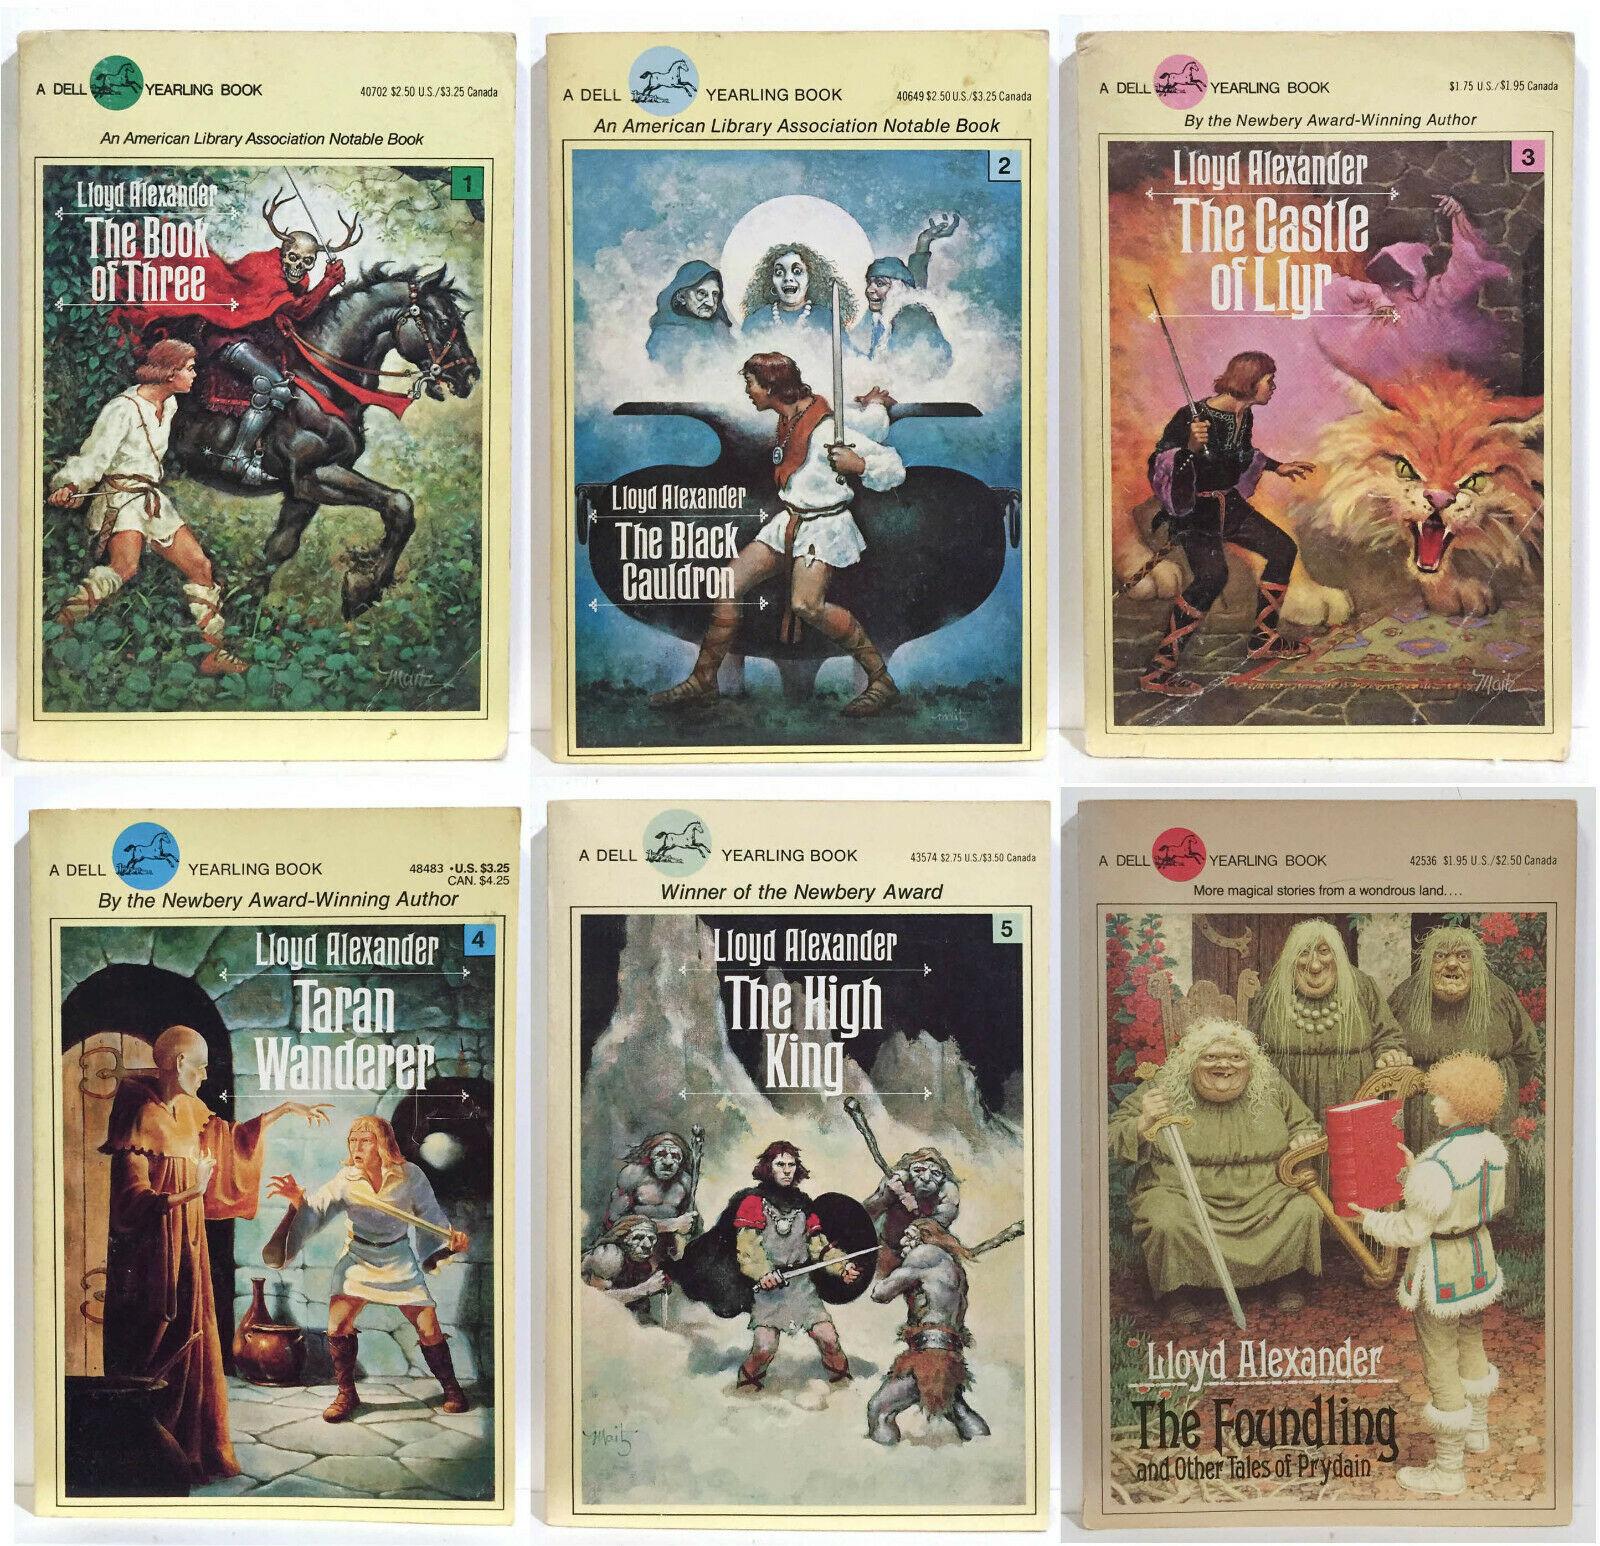 Remember Lloyd Alexander's Prydain series?